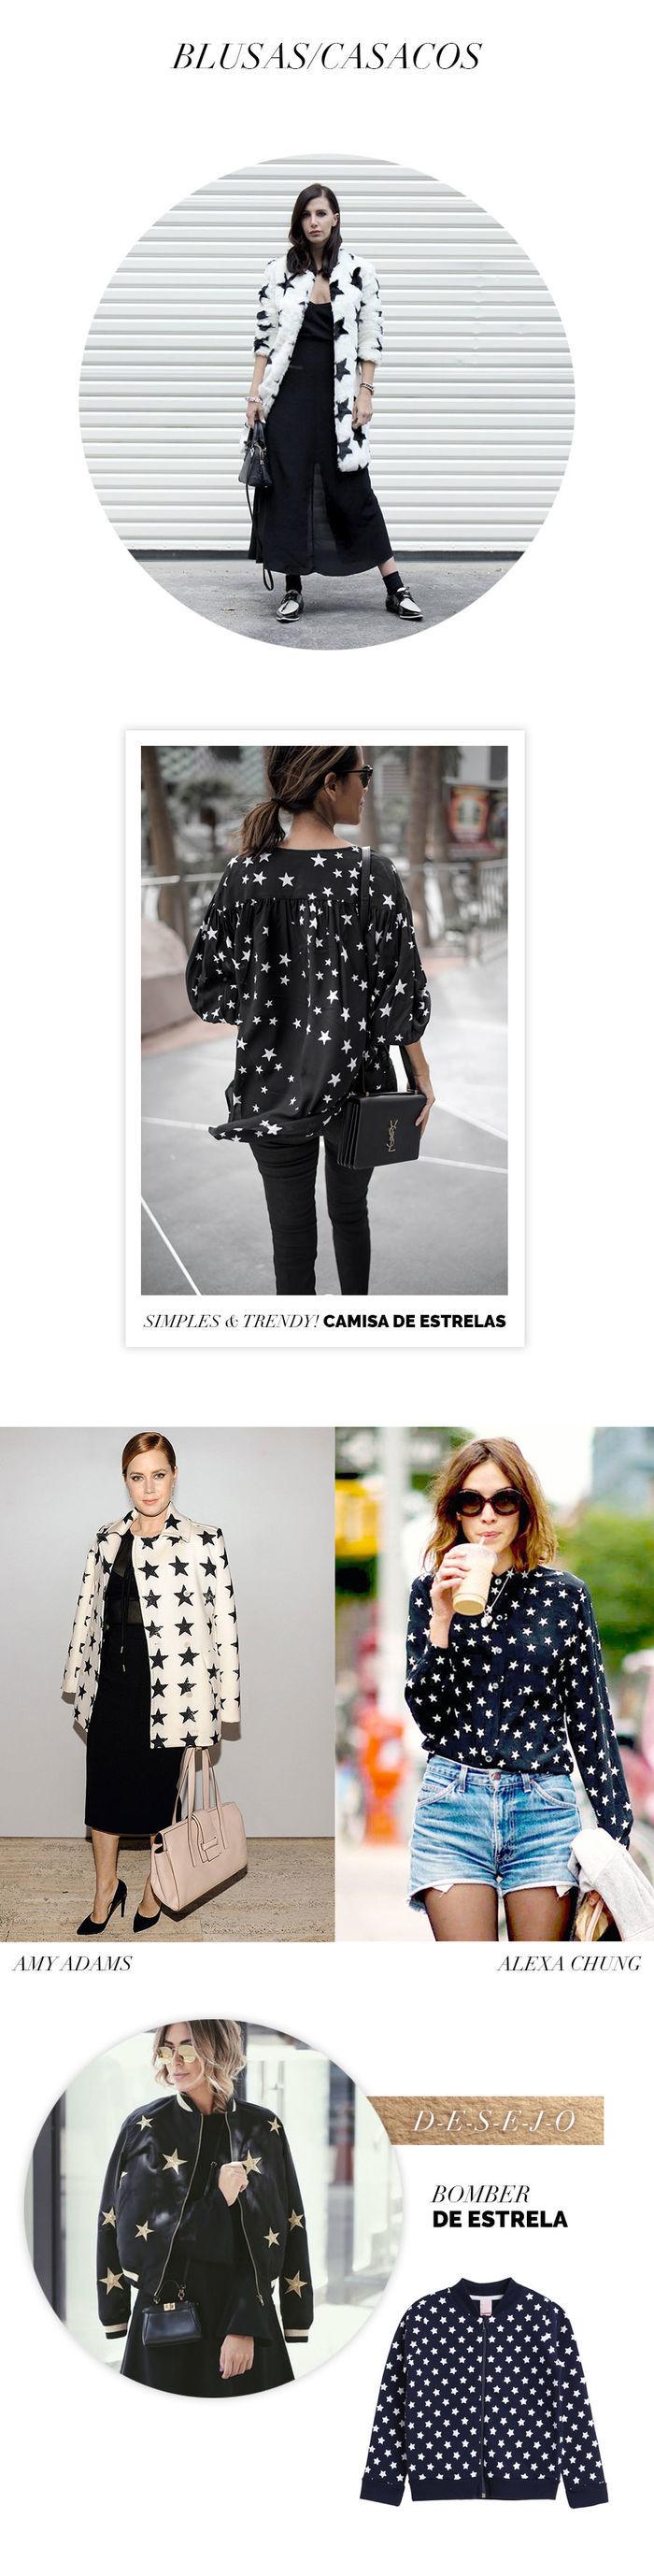 Layla Monteiro como usar look com estrela tendência acessórios casaco jaqueta bomber de estrela Alexa Chung Amy Adams casaco de pelo de estrela